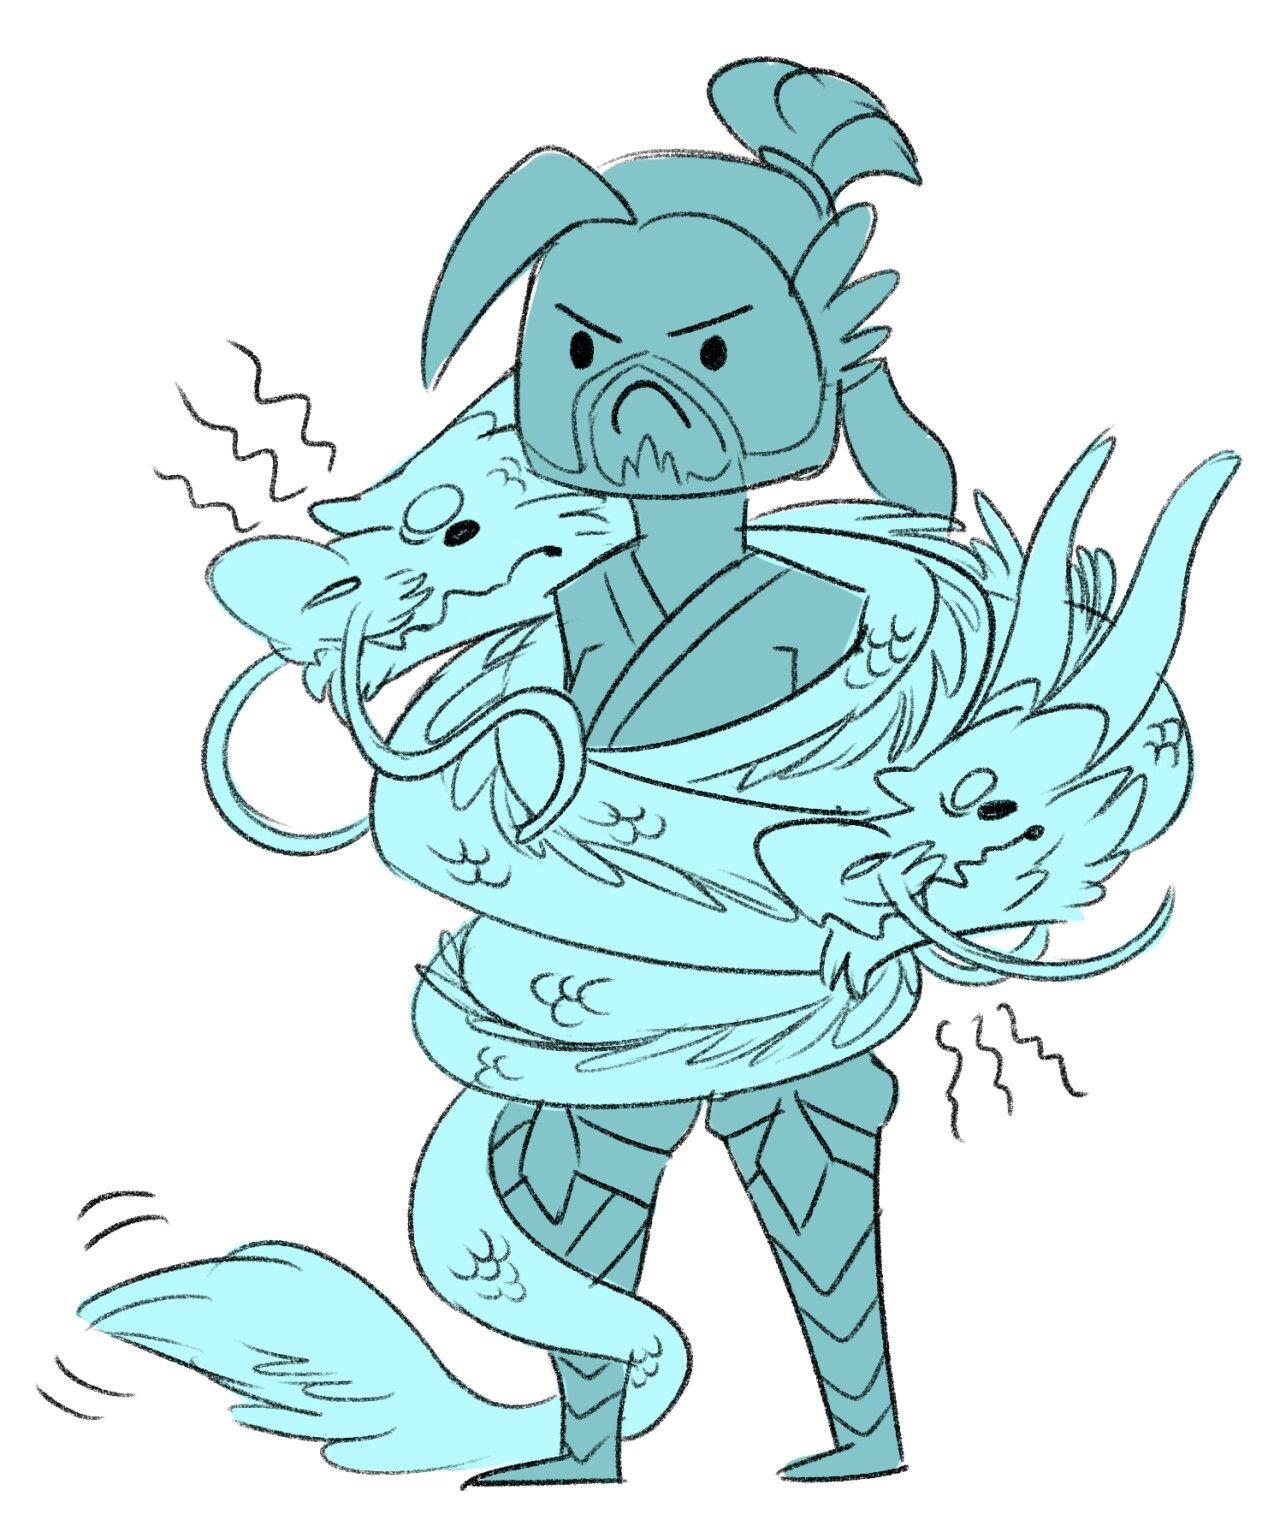 angry Shimada dragon growling* | the squad | Overwatch dragons